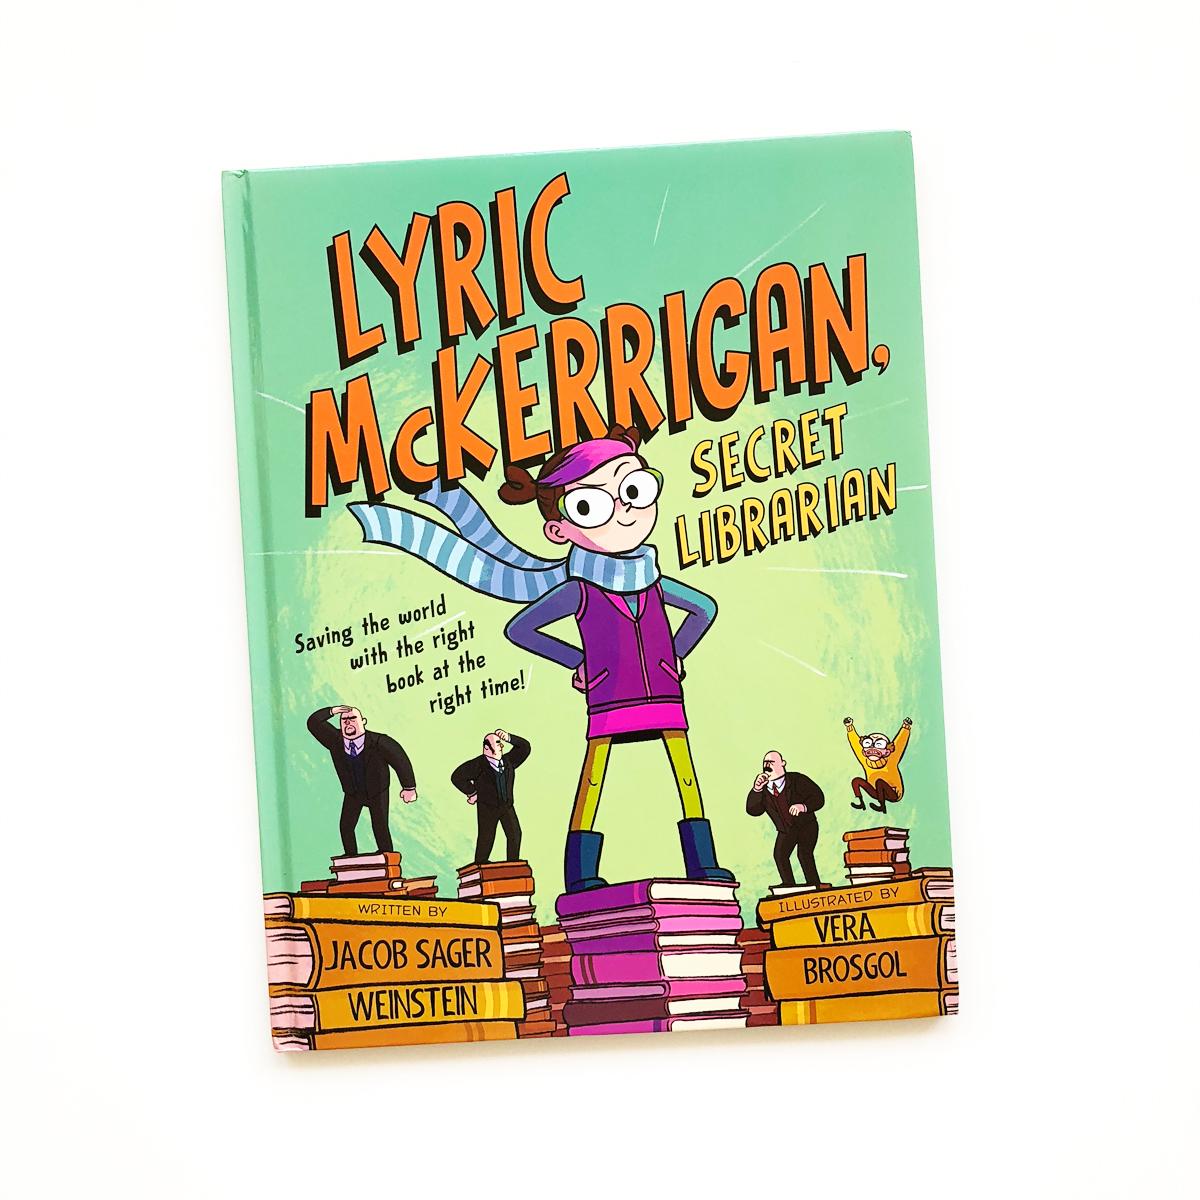 Lyric McKerrigan, Secret Librarian | Avery and Augustine